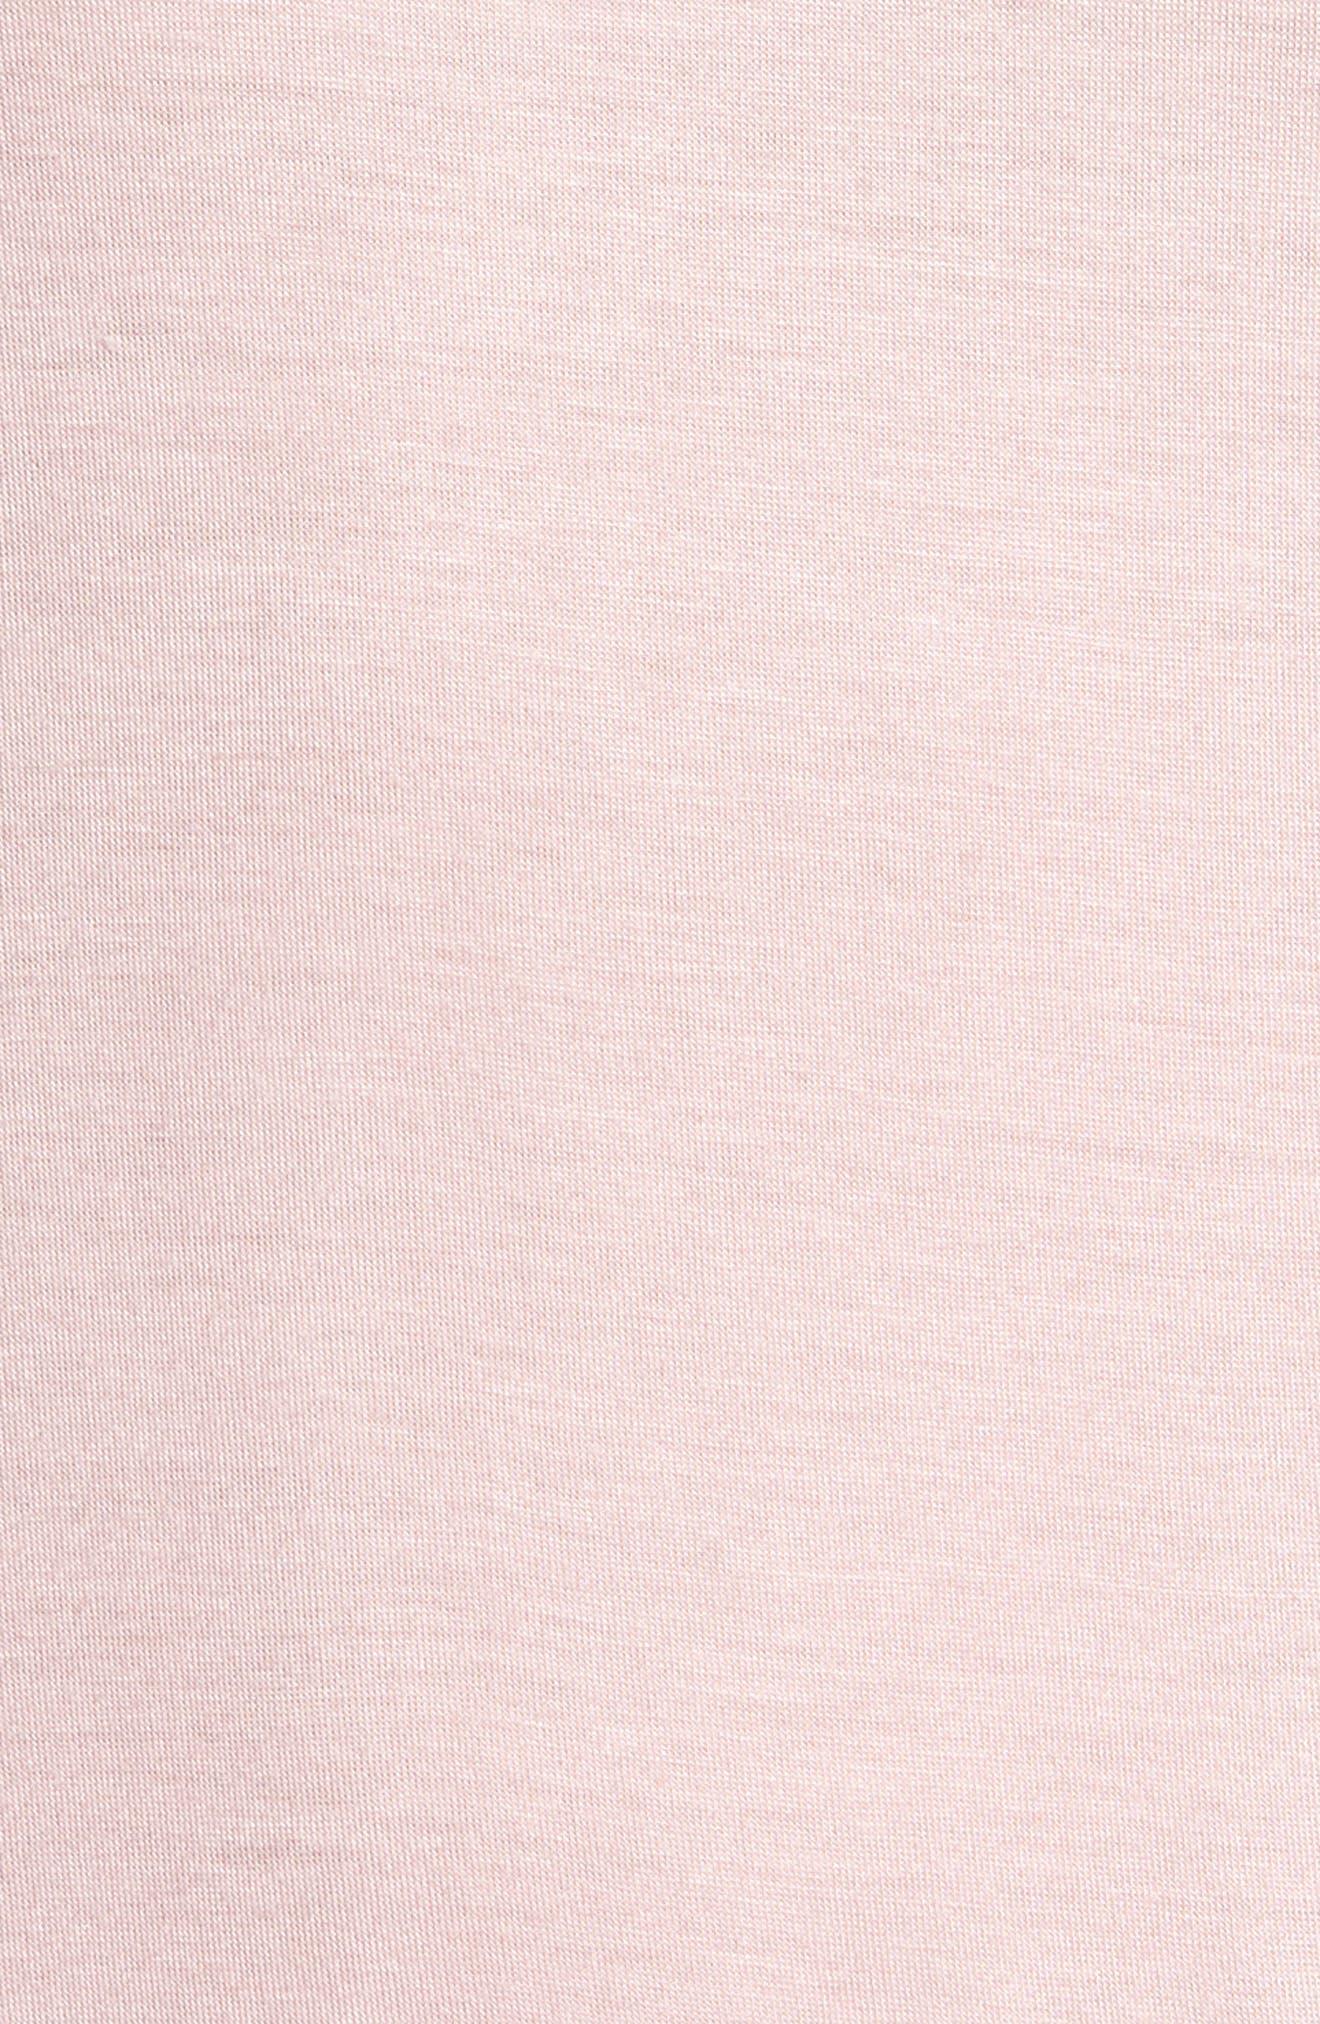 Roll Sleeve Tee,                             Alternate thumbnail 5, color,                             Pink